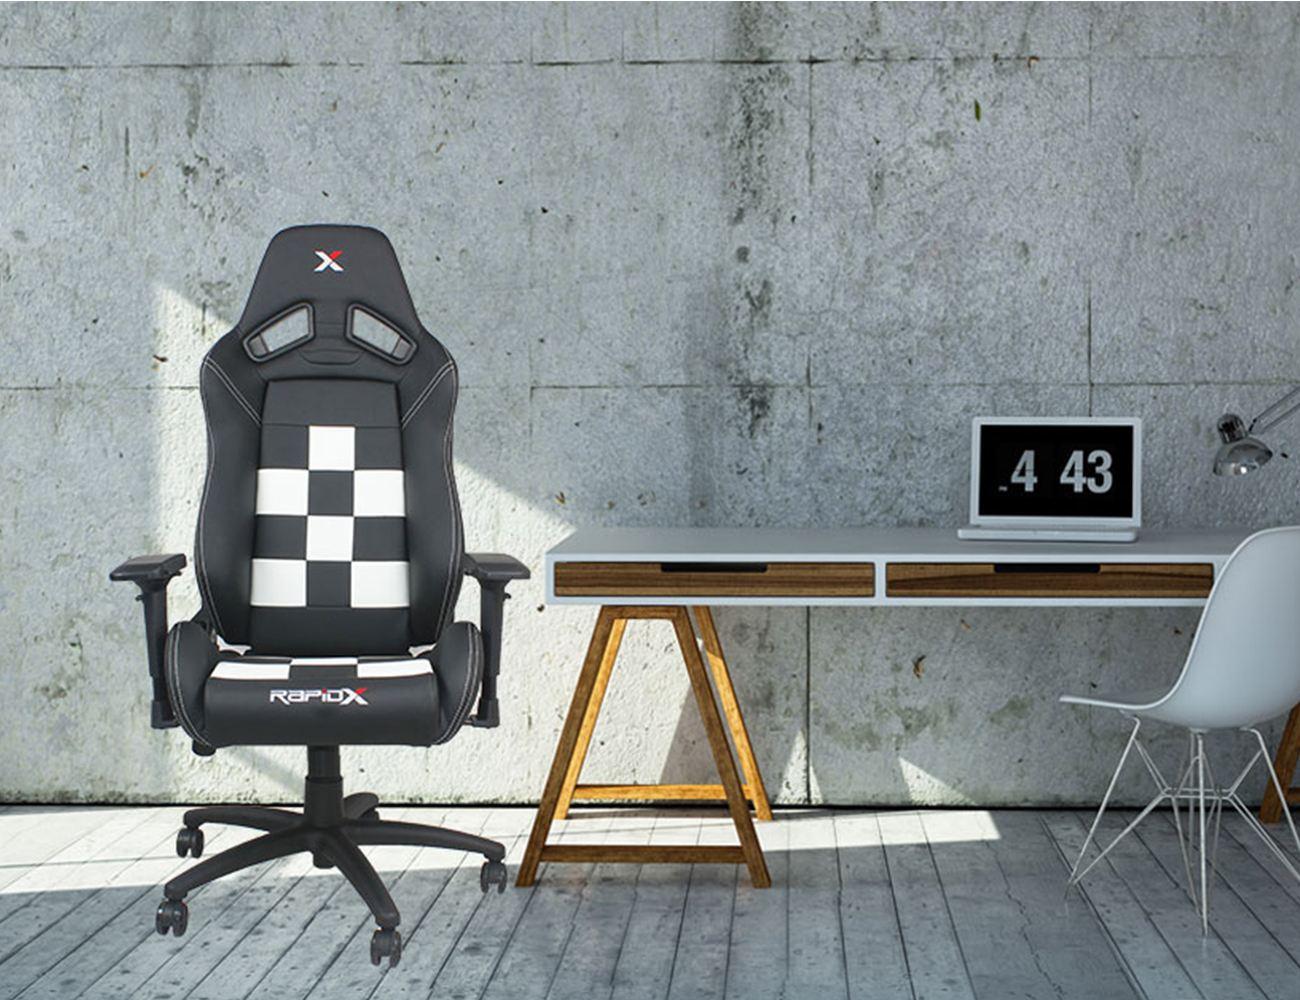 RapidX Ferrino Ergonomic Desk Chair